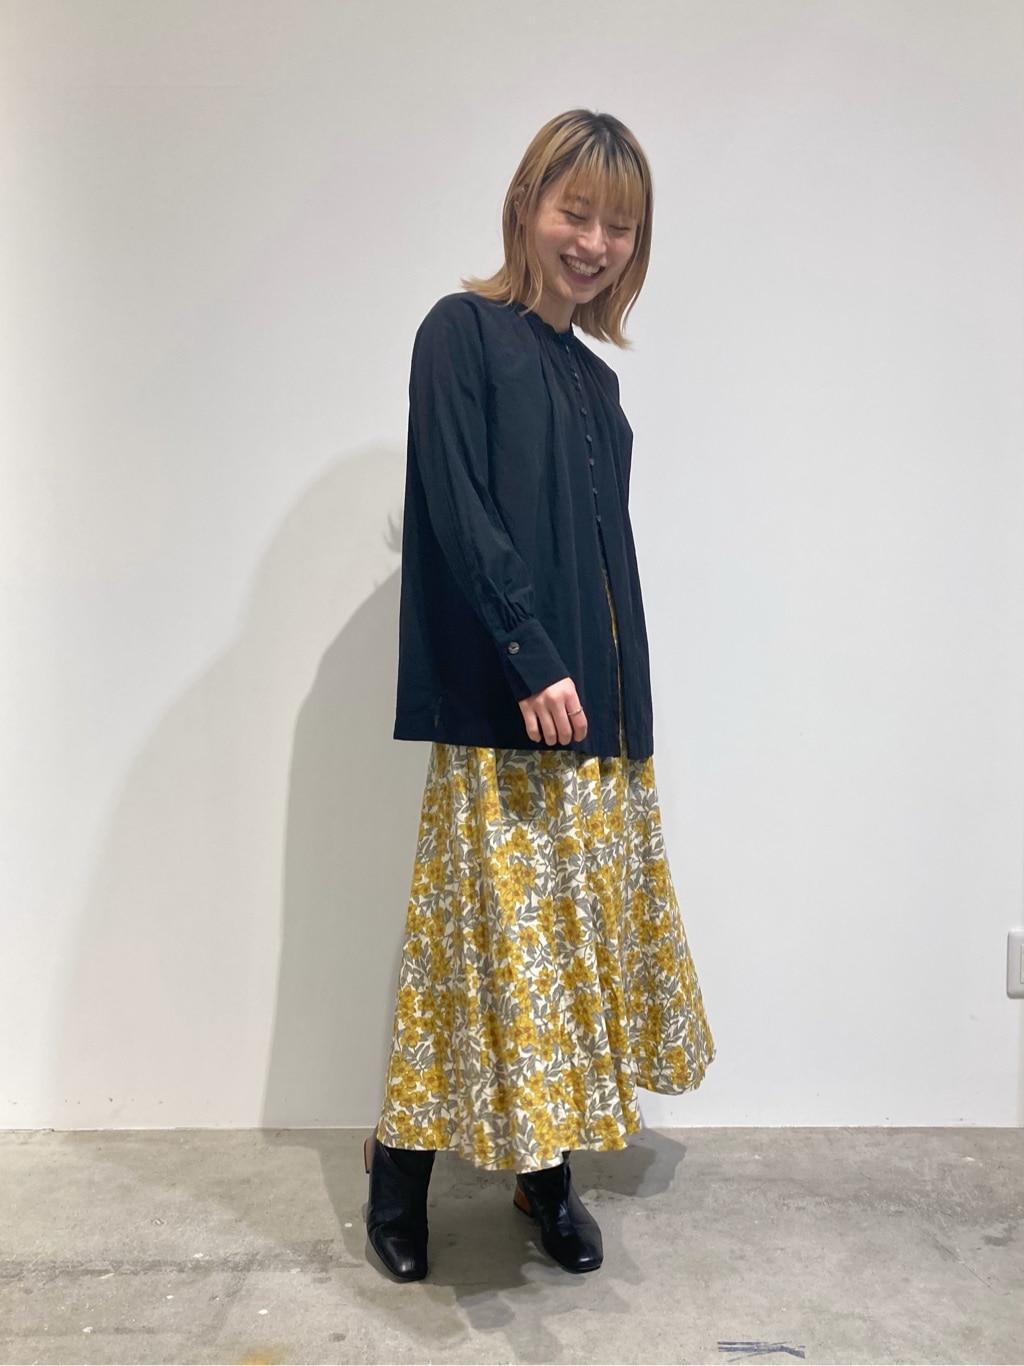 FLAT AMB 名古屋栄路面 2021.01.09